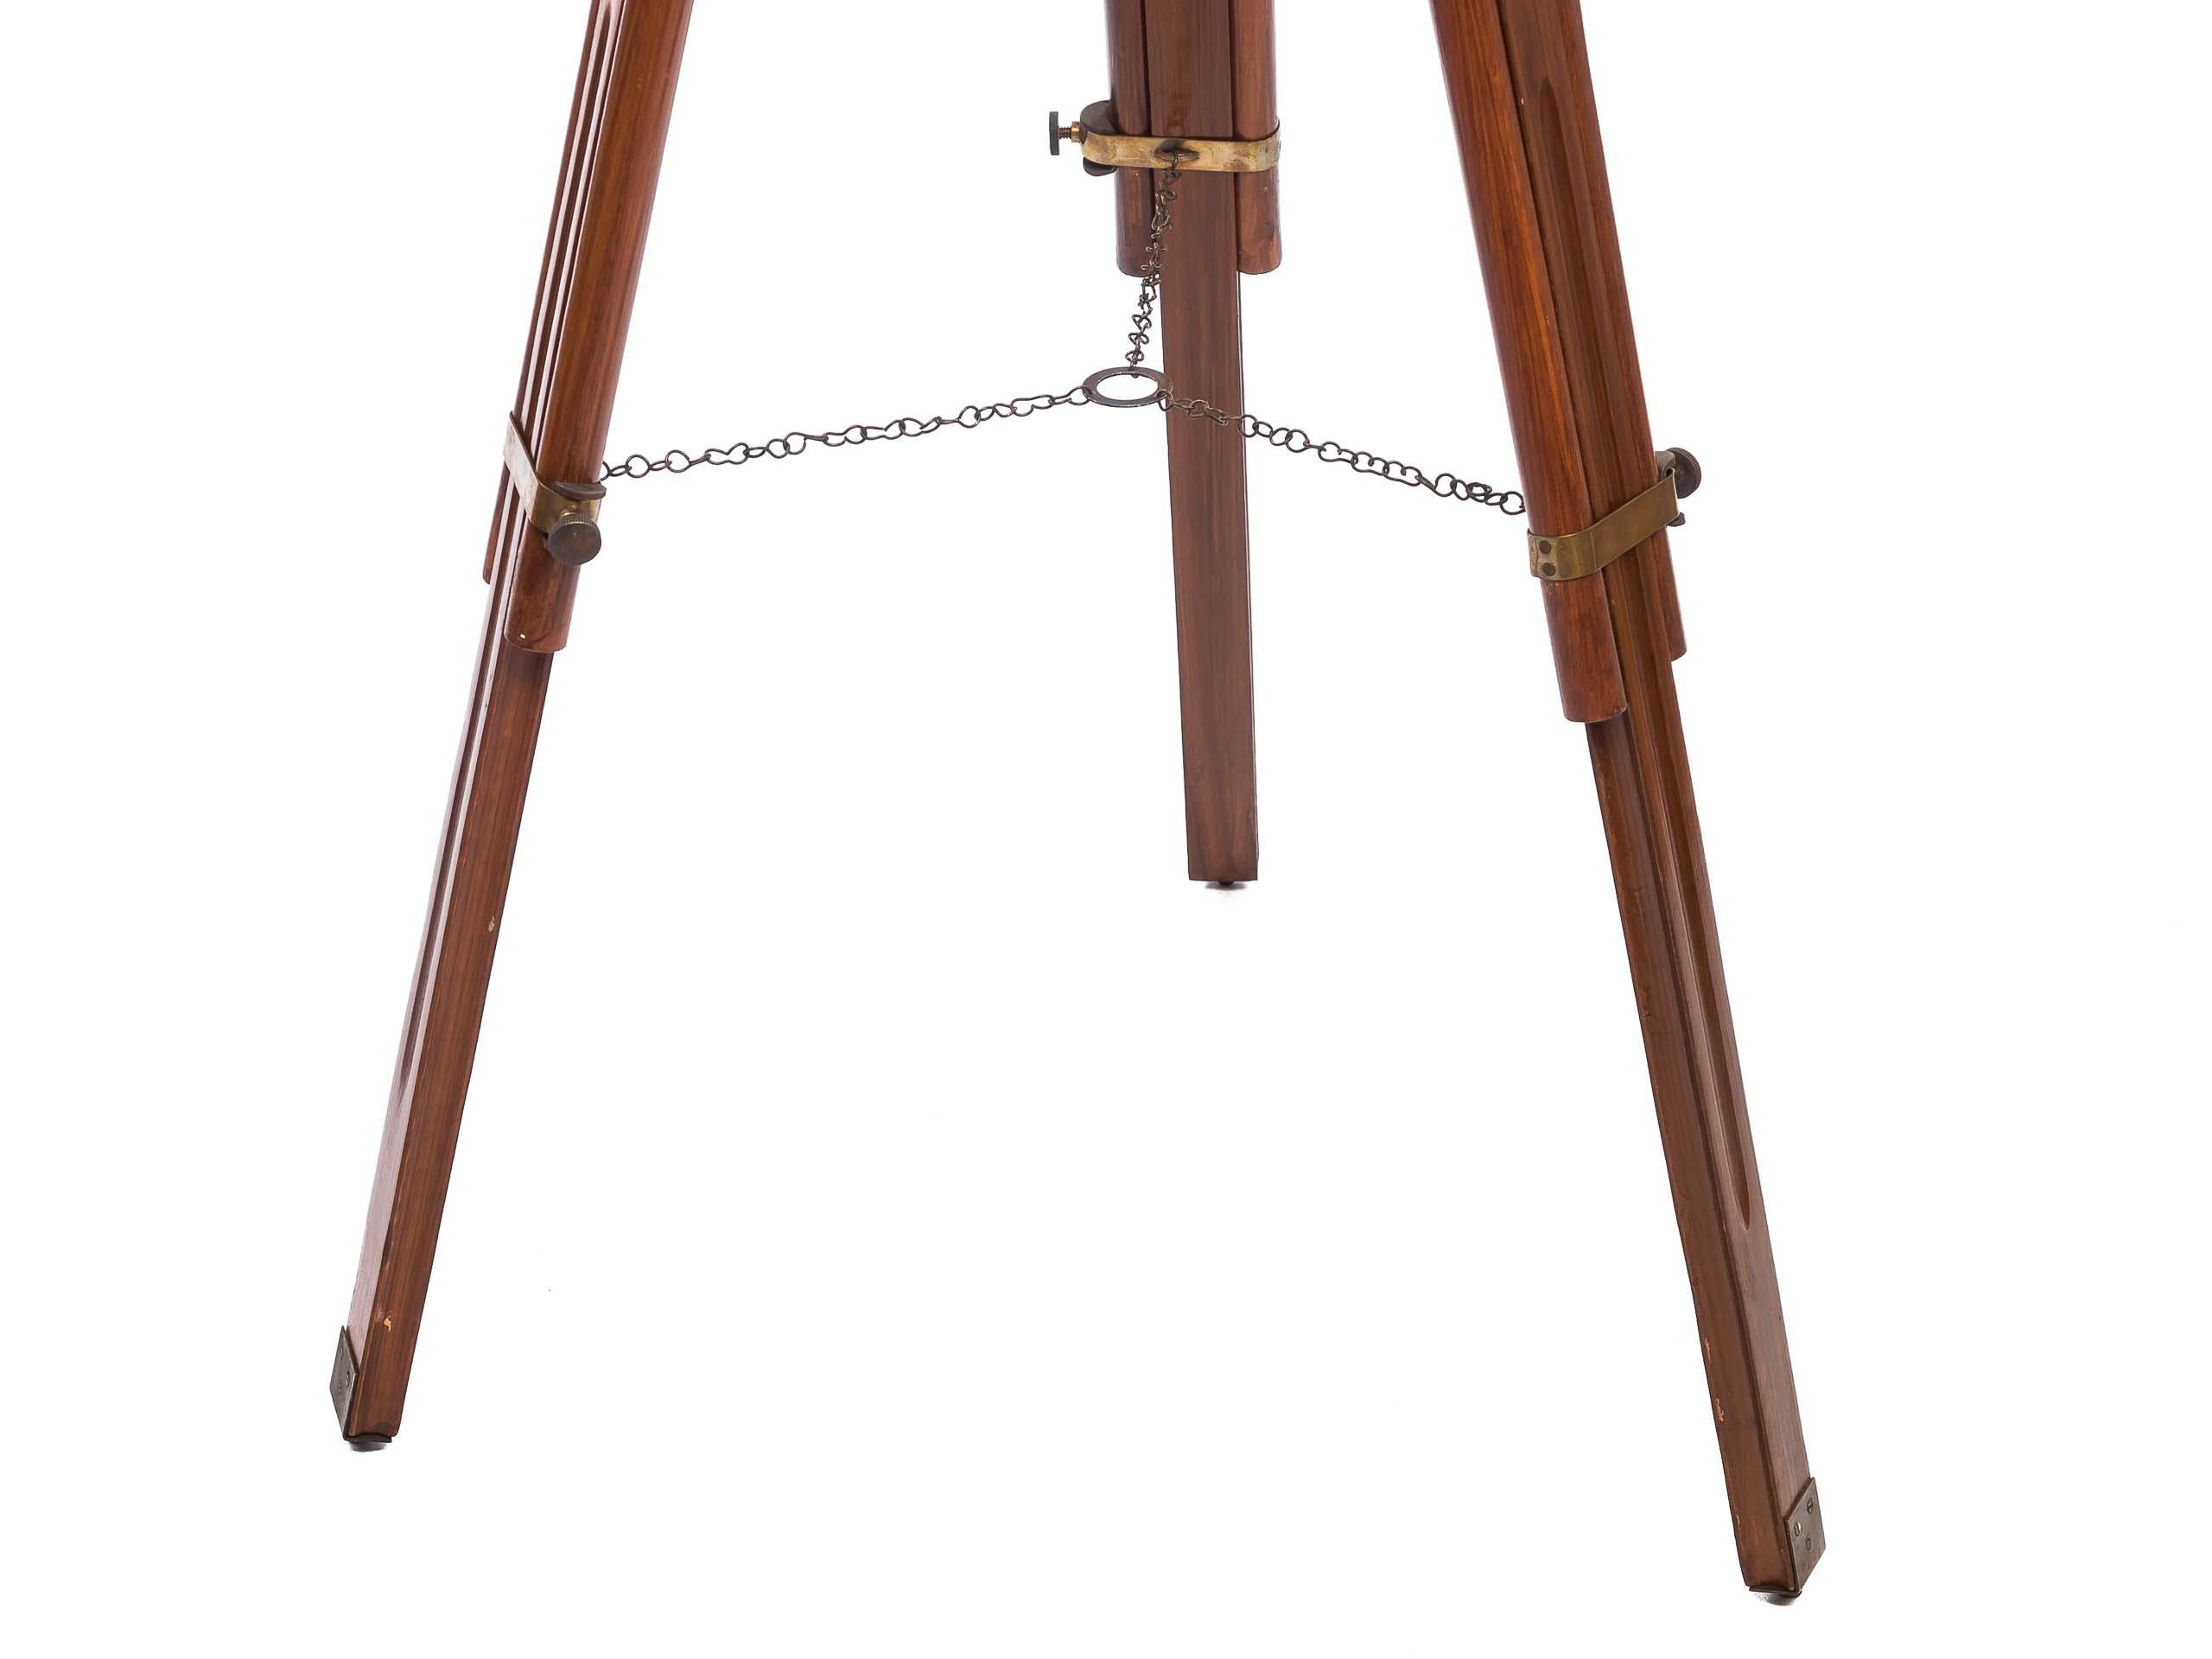 Großes Fernrohr Fernglas Teleskop Messing mit Holz Stativ 150cm antik Stil